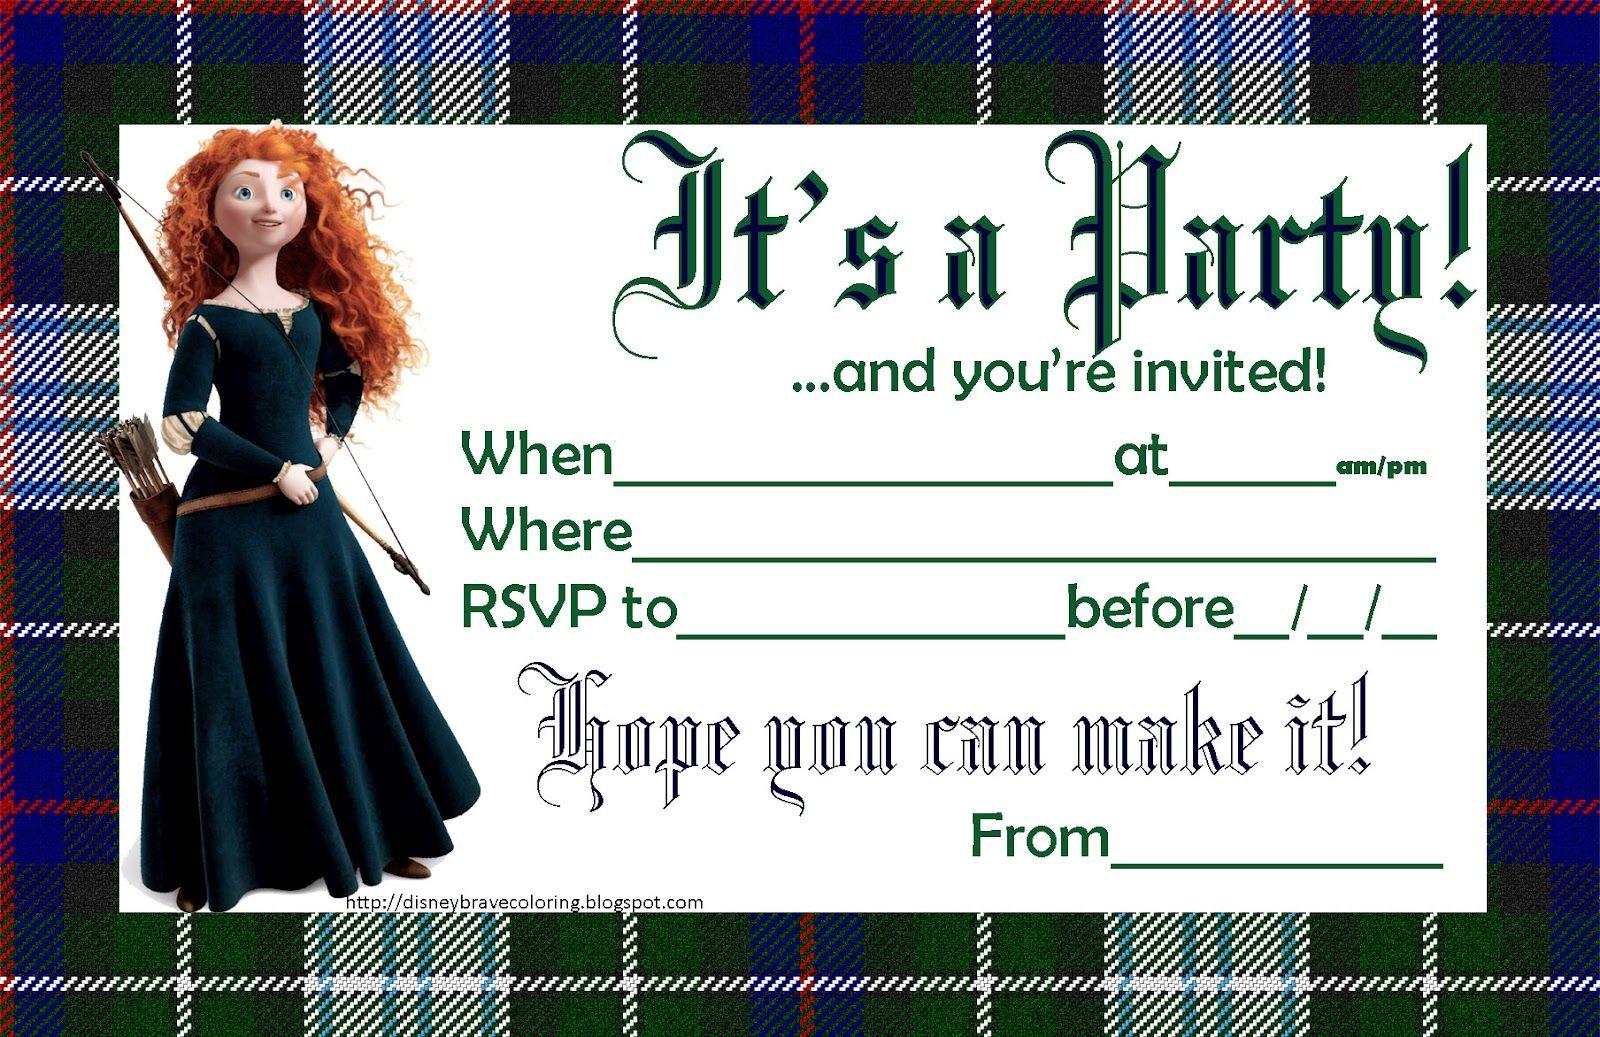 Itus merida free printable disney pixar brave party invitations